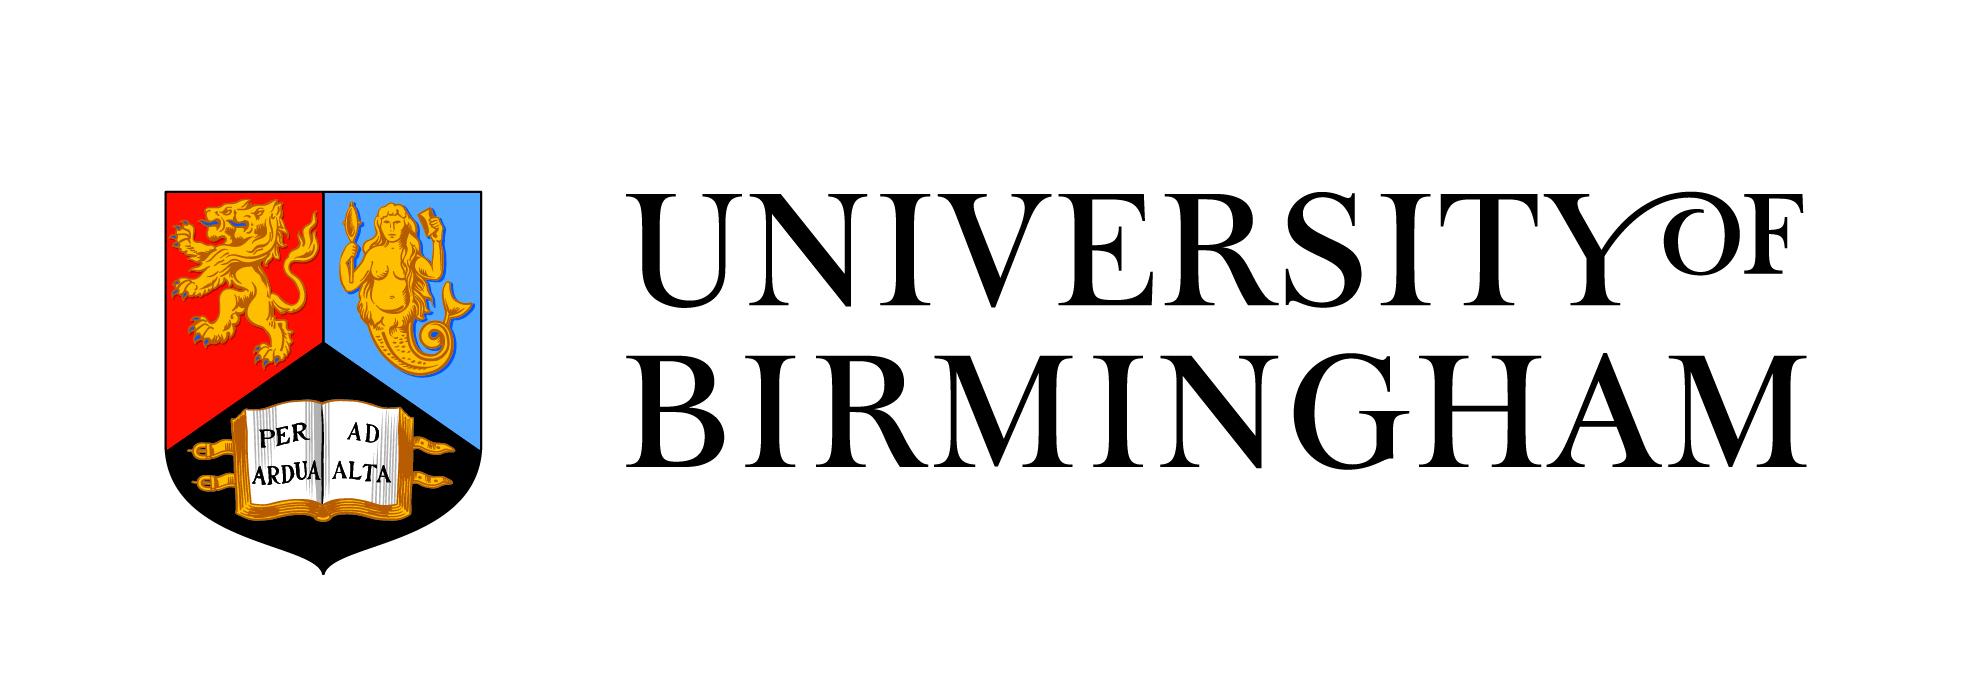 uob crest logo